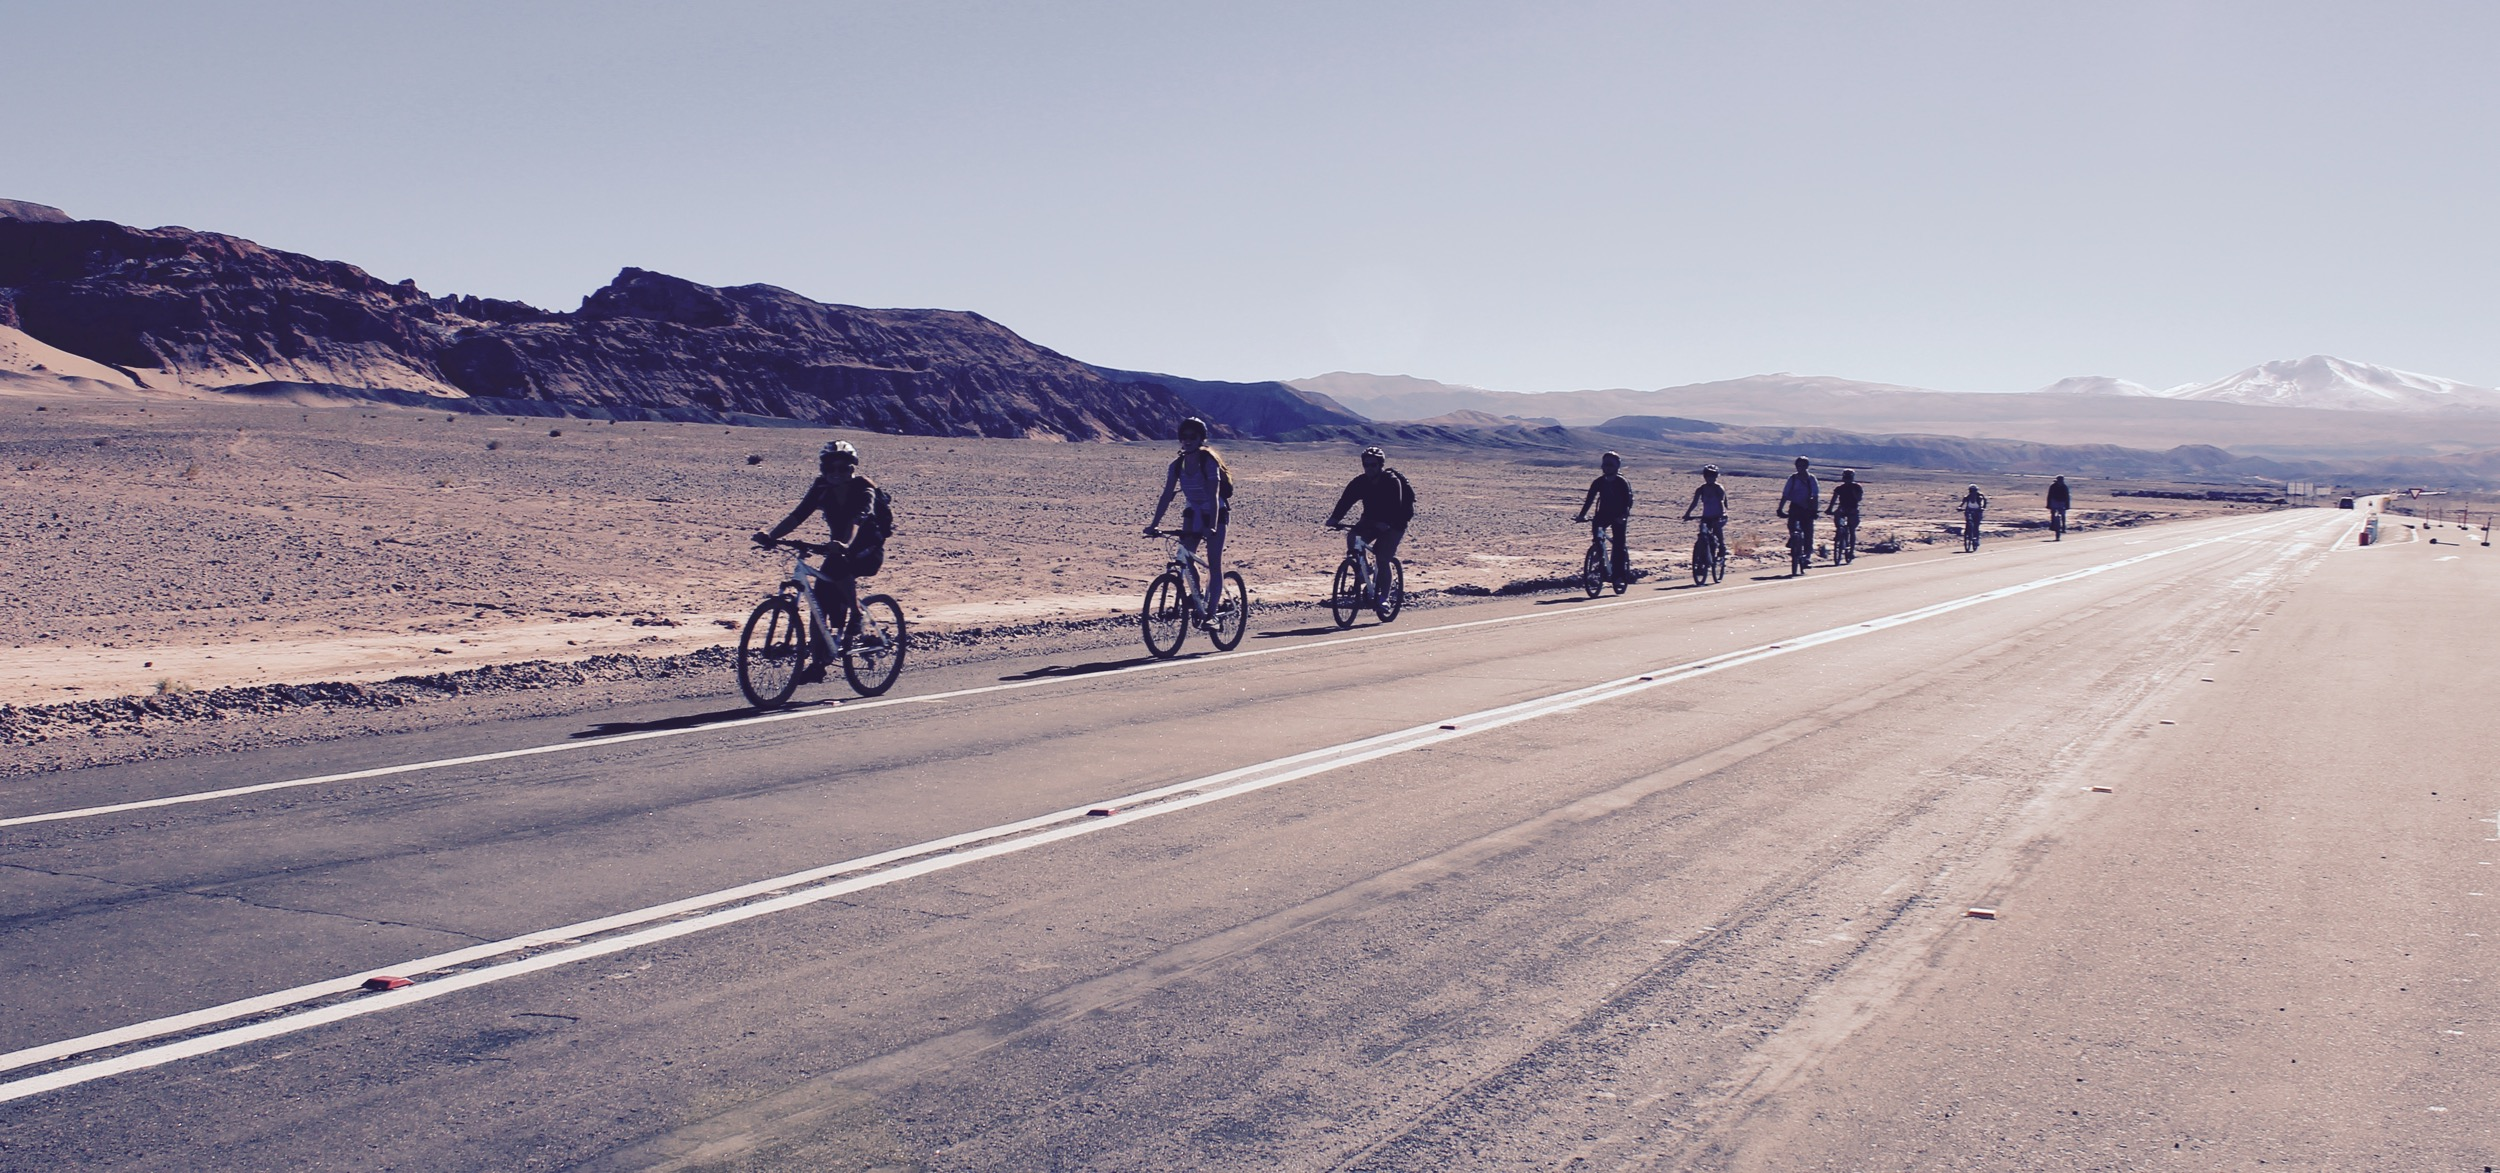 bikers_line.jpg